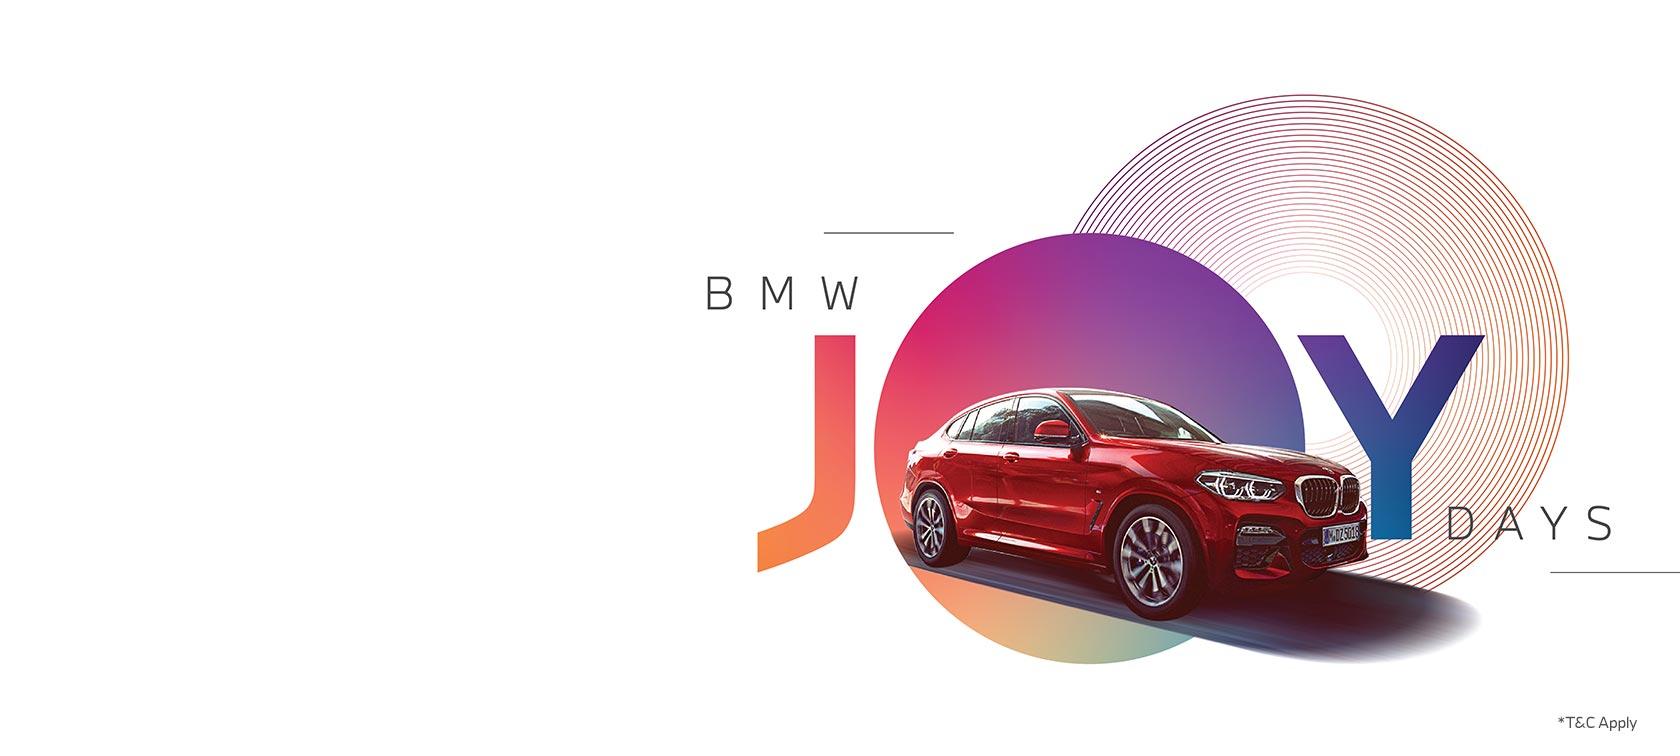 The BMW X4 SERIES